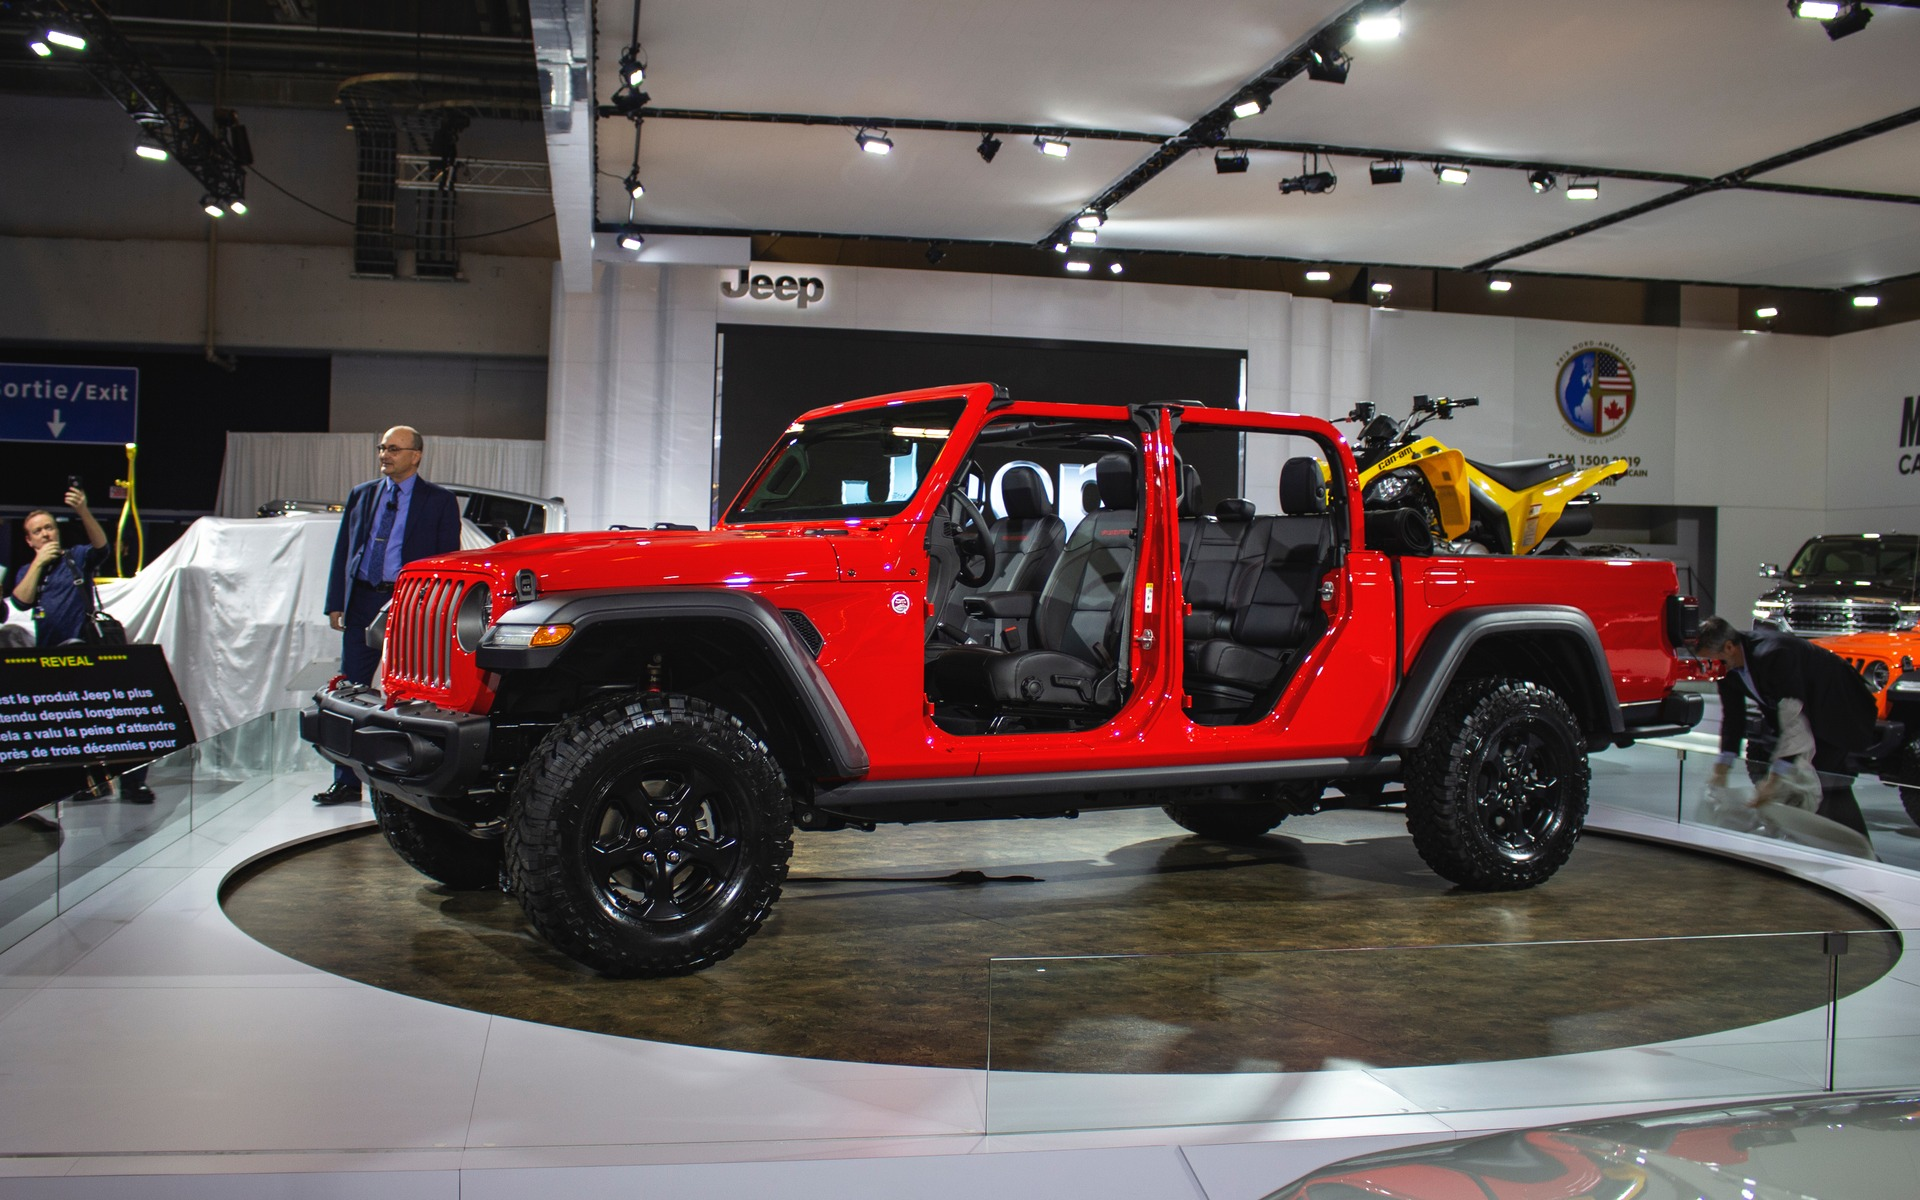 Le Jeep Gladiator 2020 arrive au Québec - Guide Auto